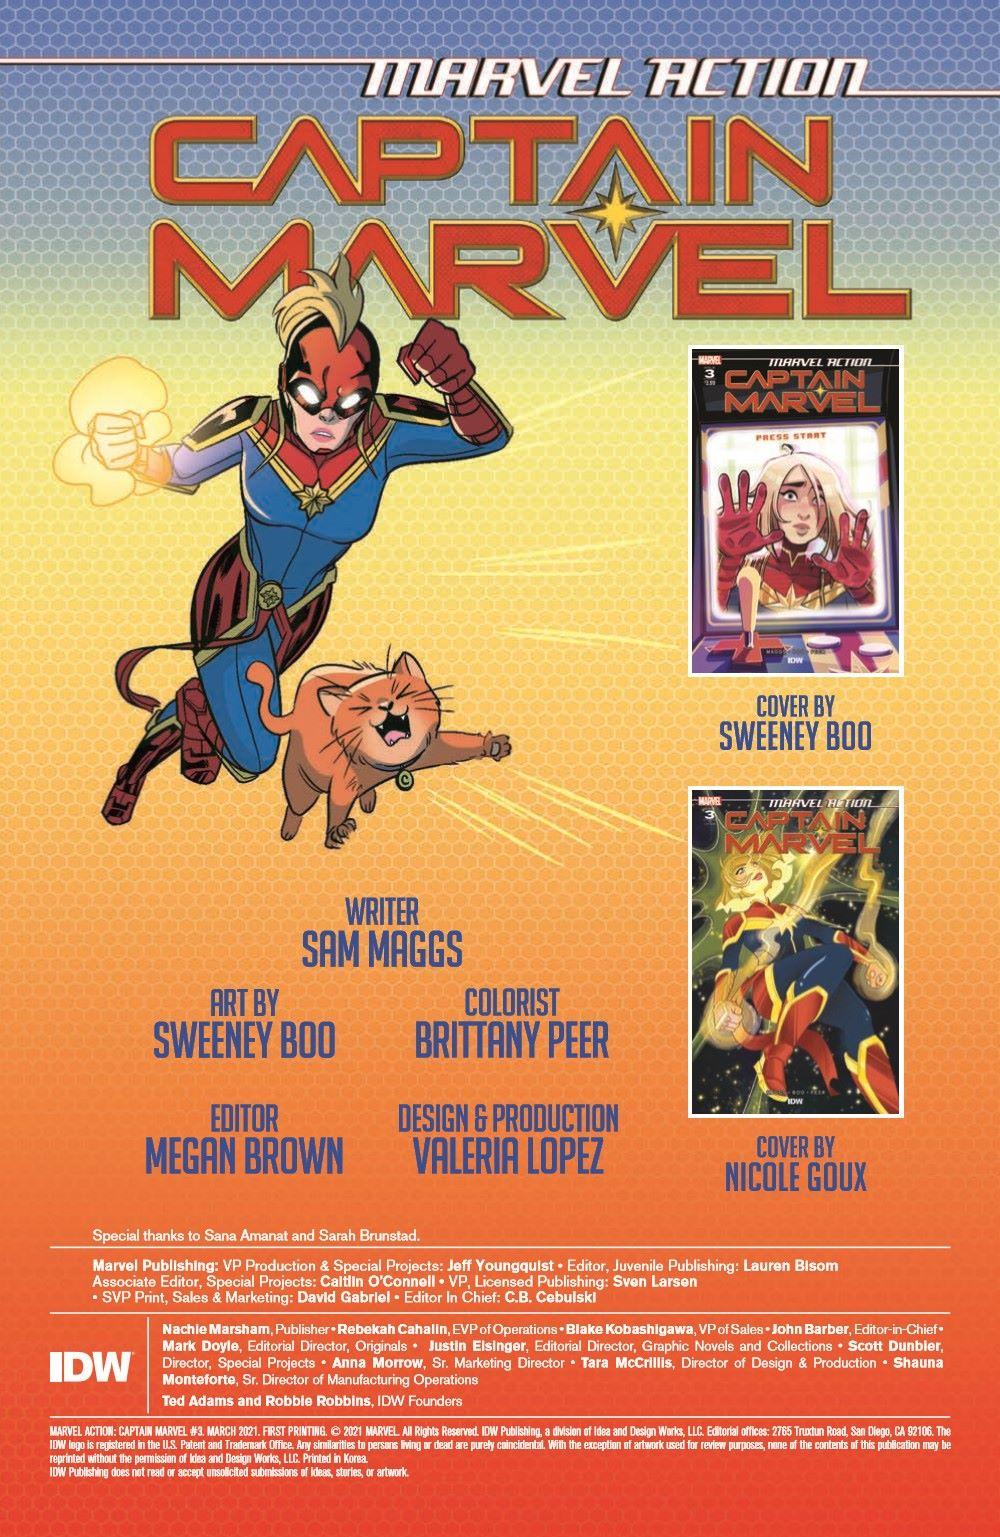 CaptainMarvel2_03_pr-2 ComicList Previews: MARVEL ACTION CAPTAIN MARVEL VOLUME 2 #3